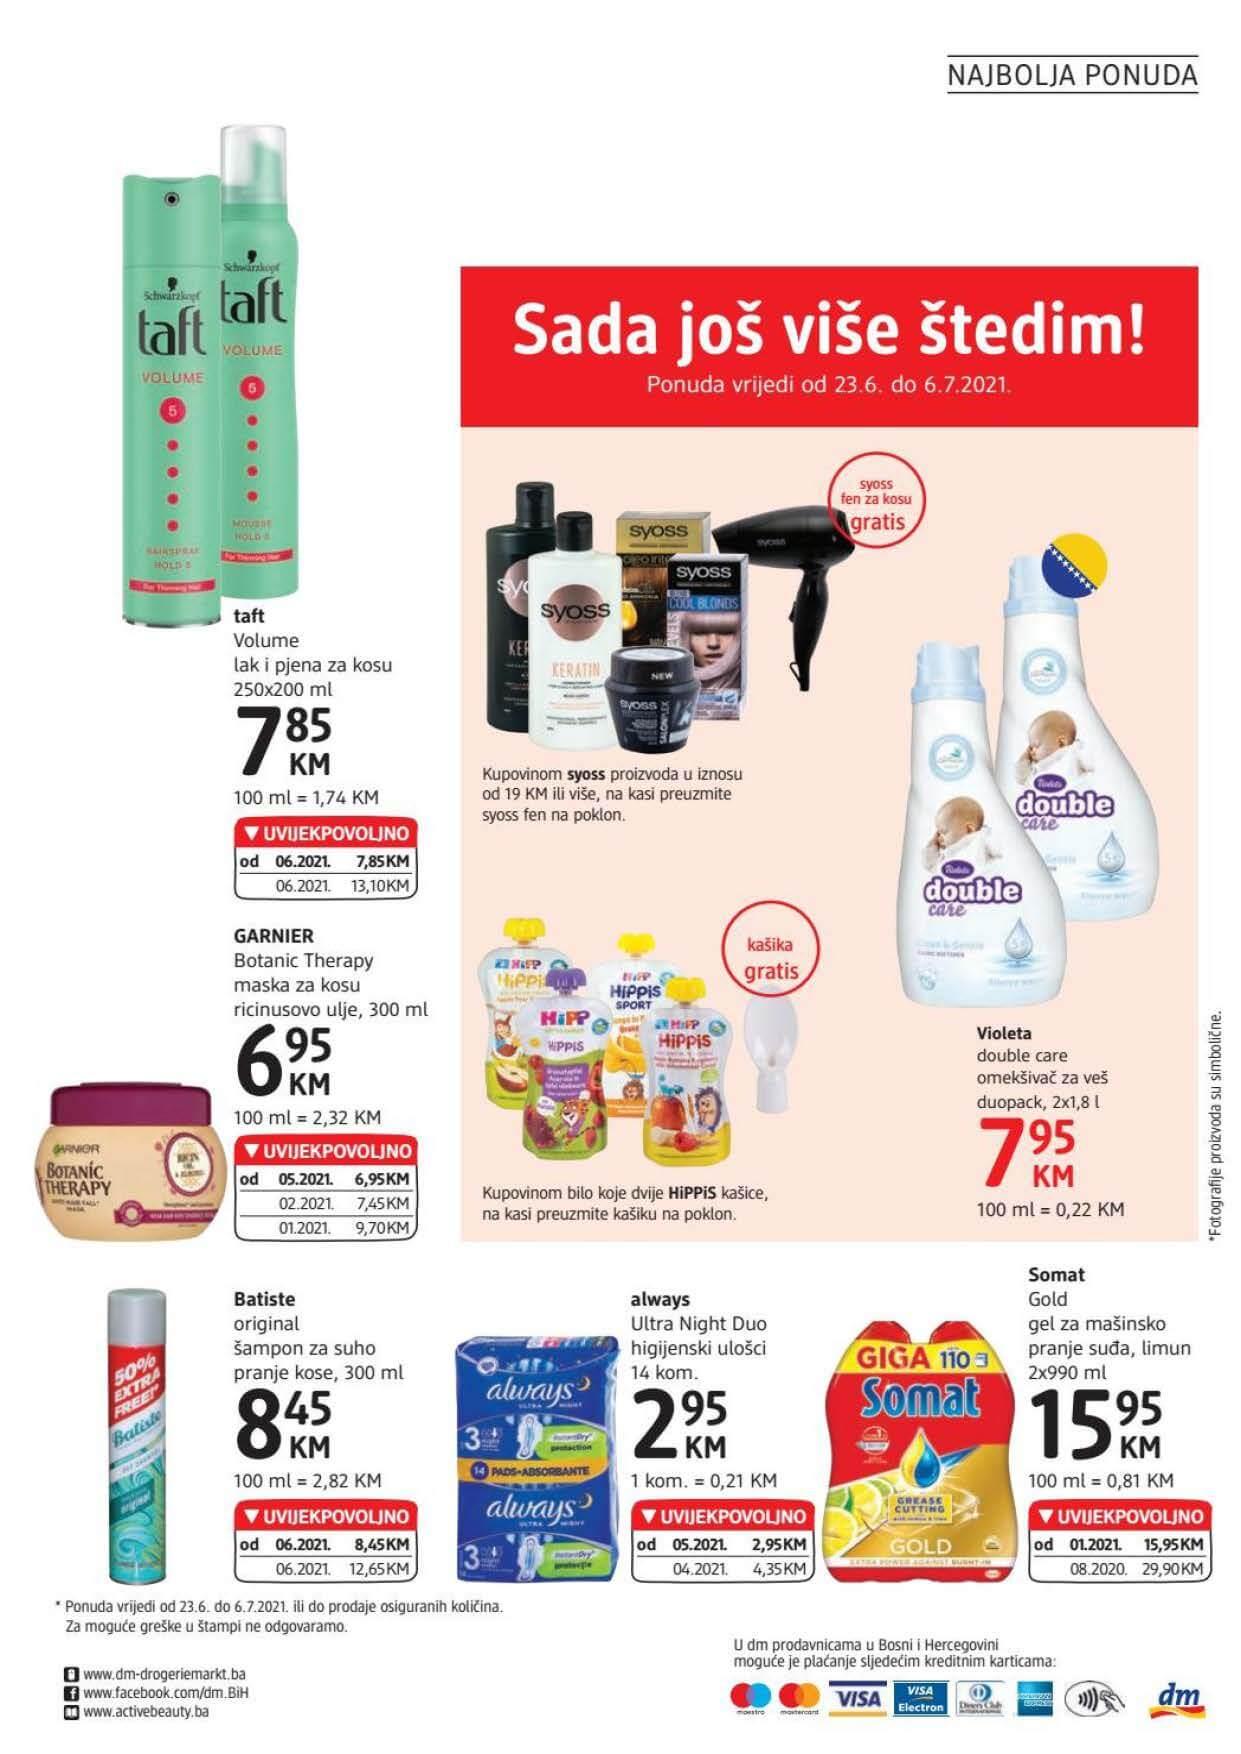 DM Katalog BiH JUN JUL 2021 23.6.2021. 6.7.2021. eKatalozi.com PR Page 24